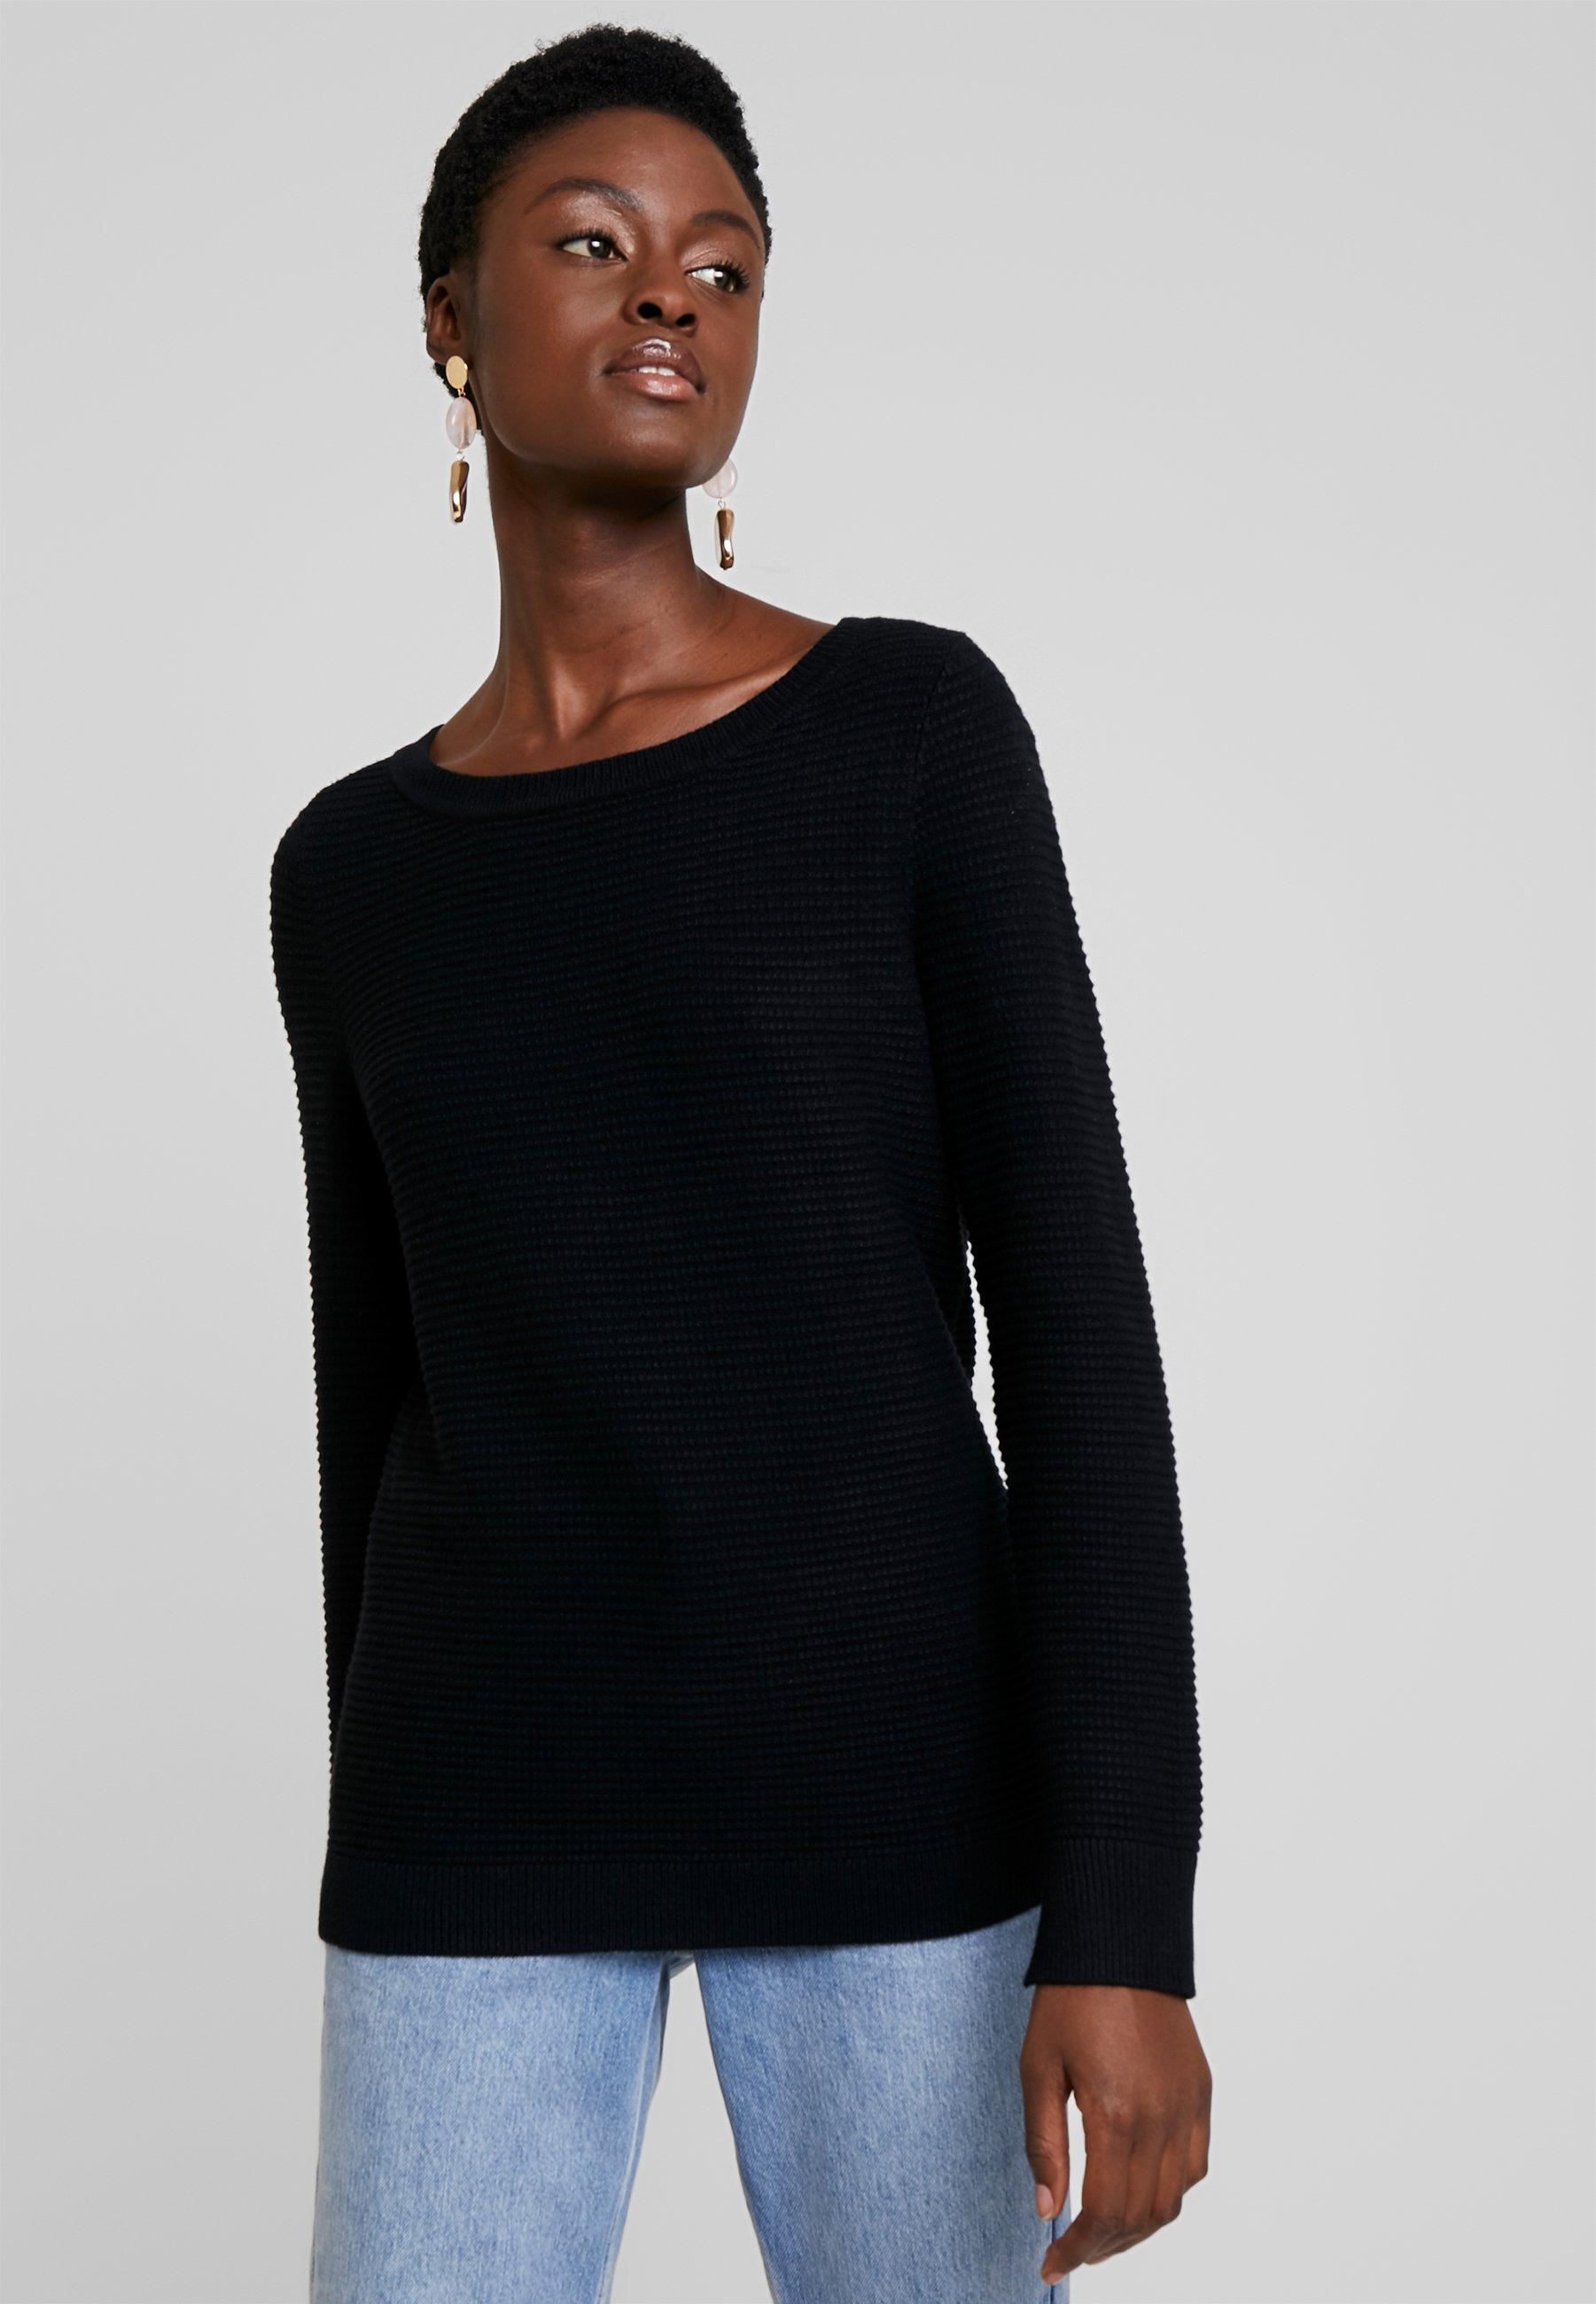 Esprit Black OttomanPullover Esprit OttomanPullover Esprit Black OttomanPullover Black Esprit OttomanPullover dCErWxQBoe